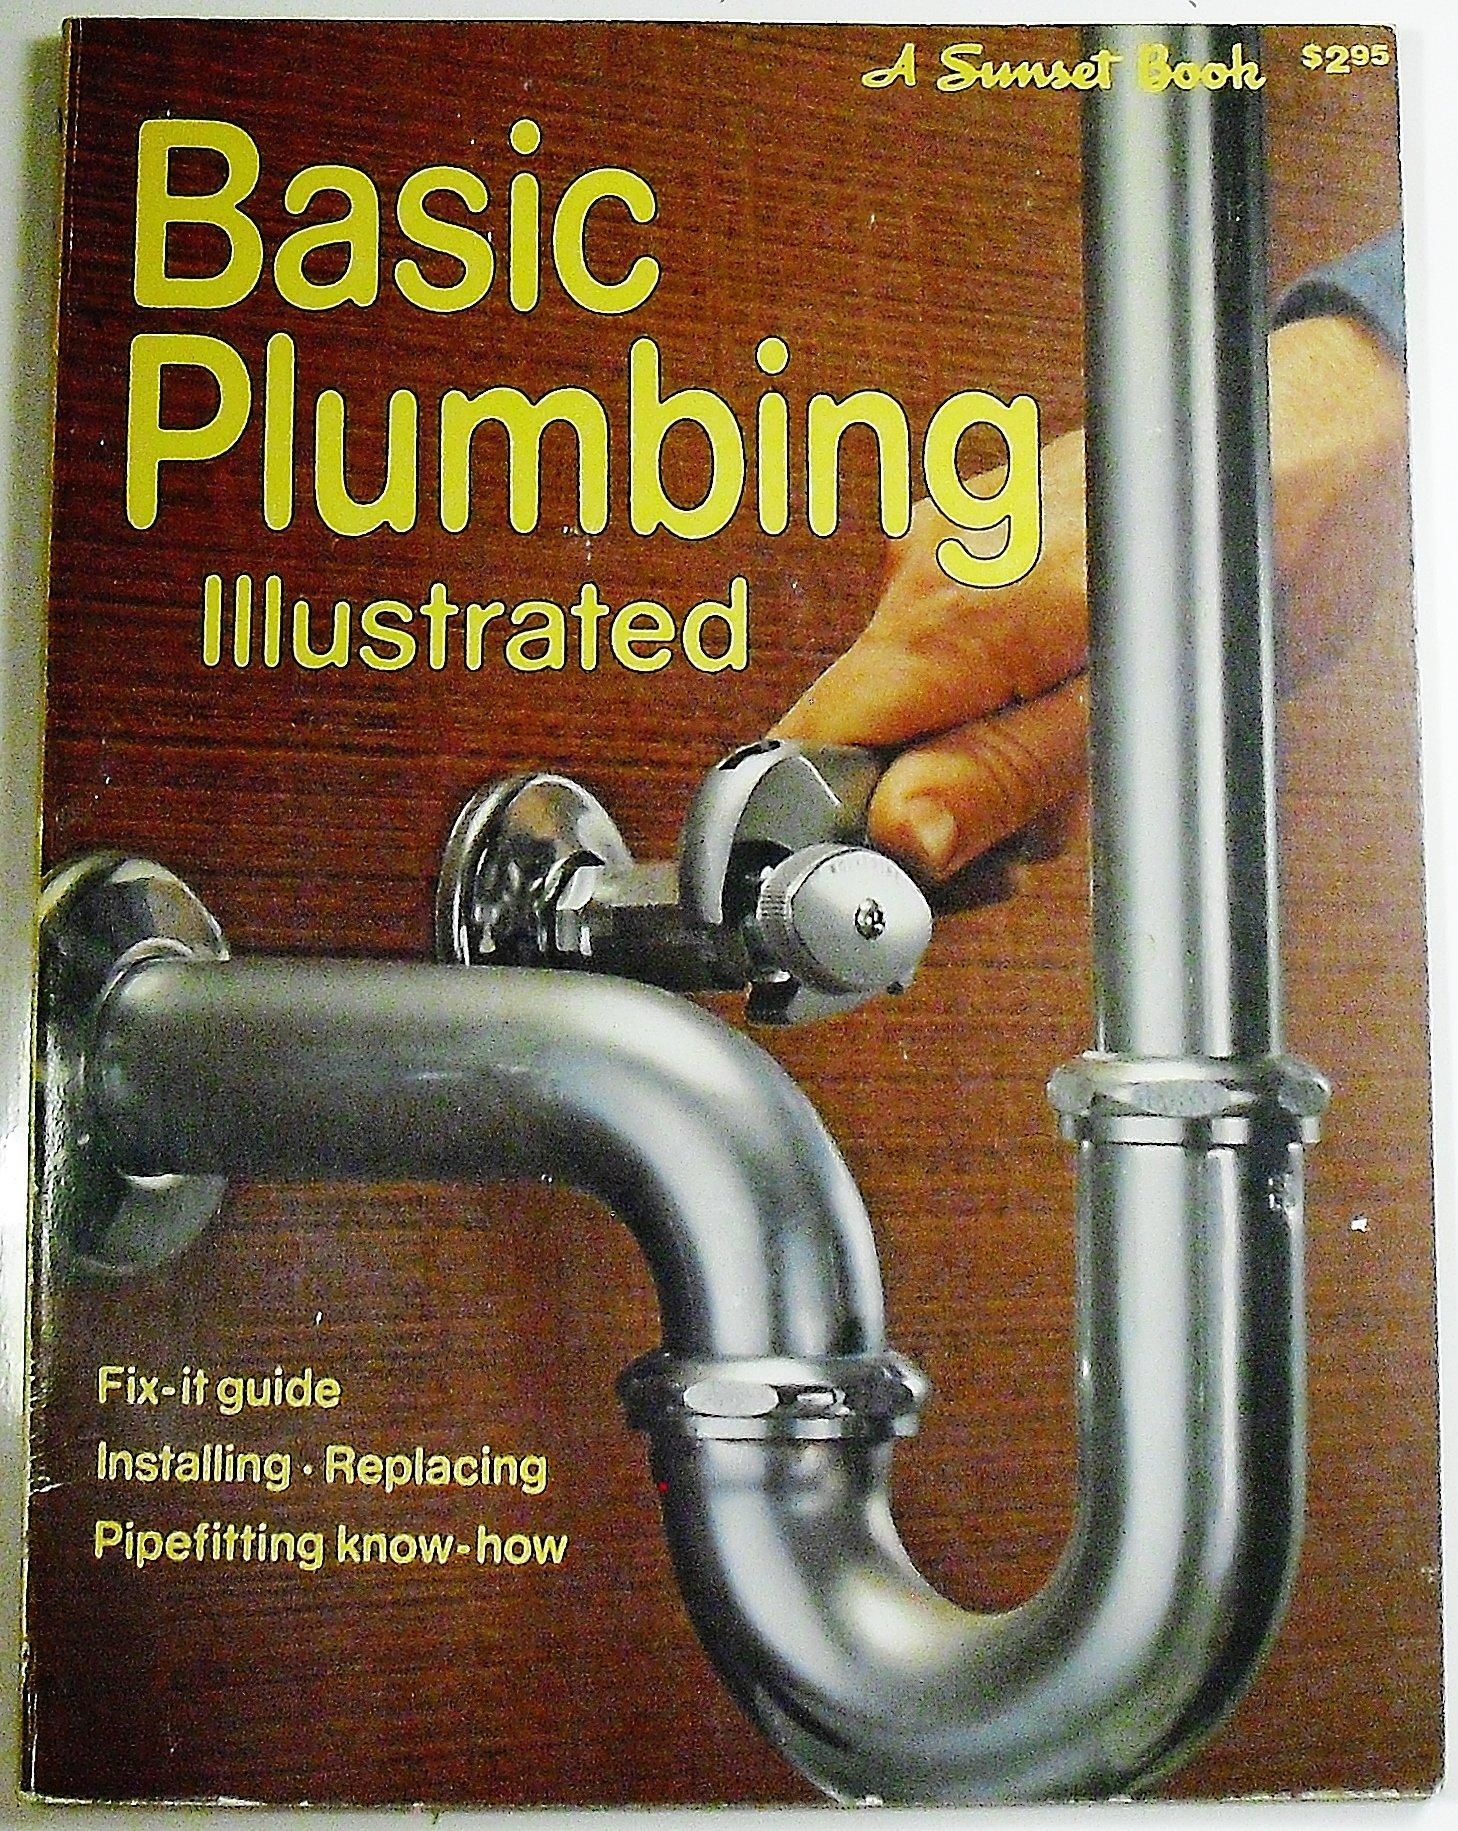 Basic Plumbing Illustrated (A Sunset Book): no Author, Yes: 9780376014634:  Amazon.com: Books